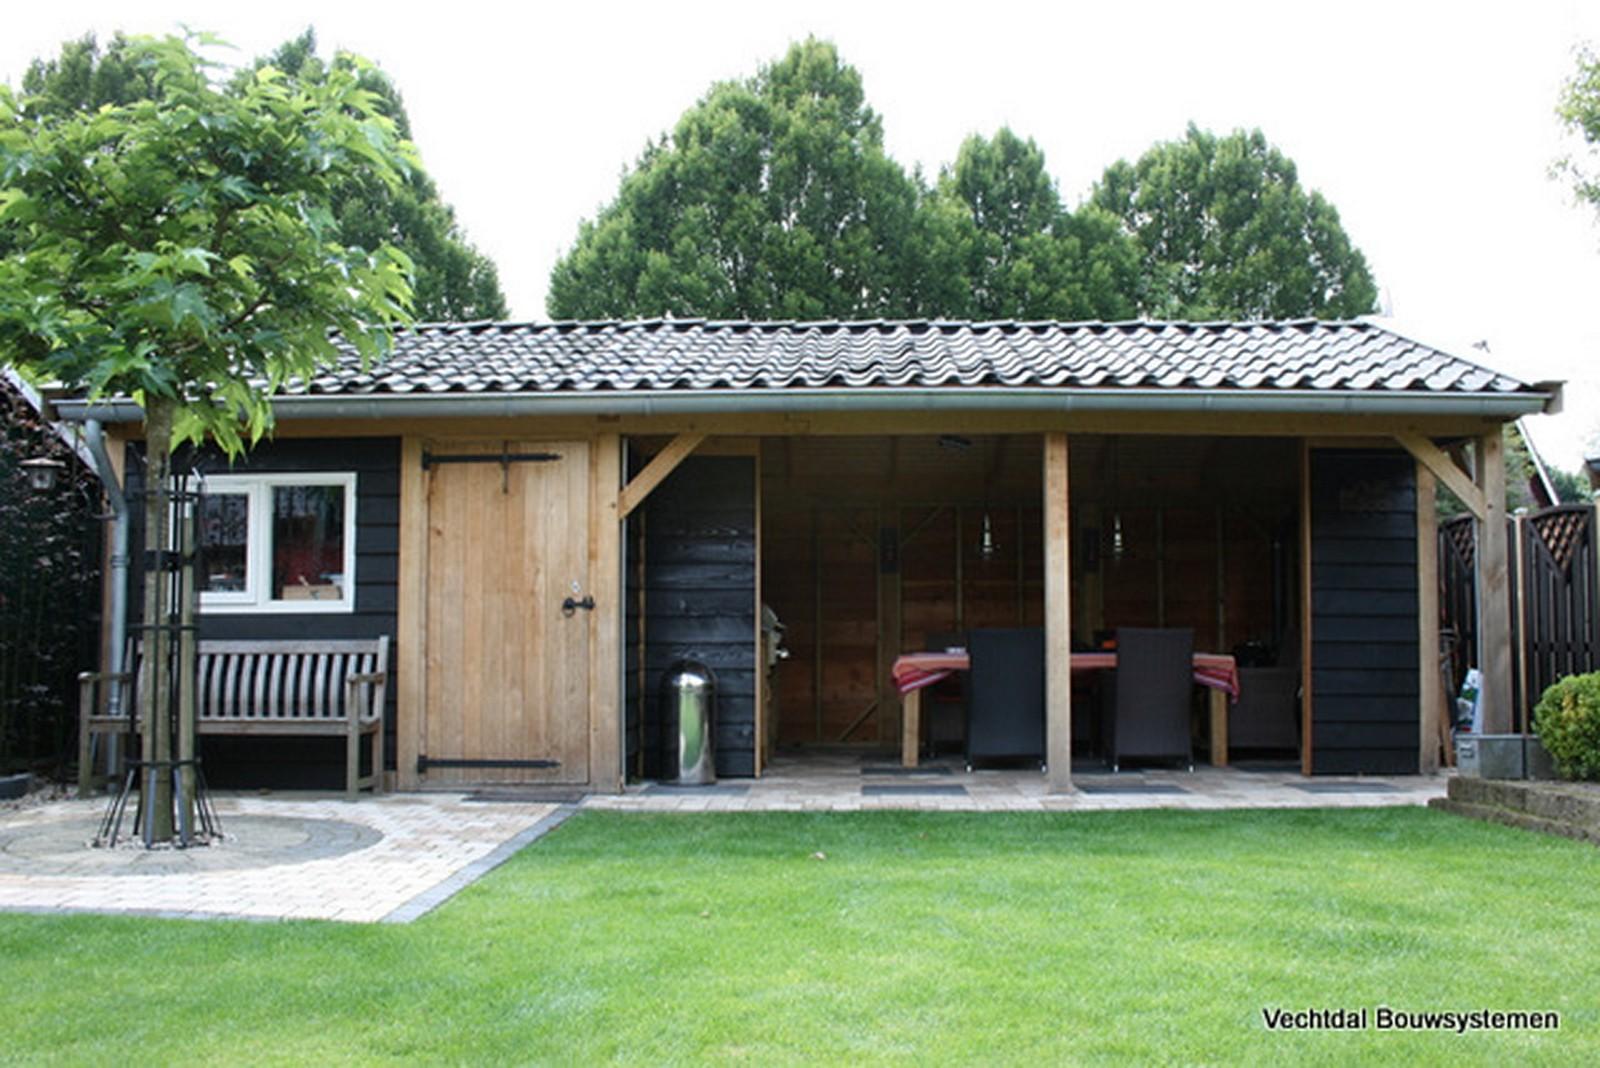 duurzame_buitenkamer - Authentiek eikenhouten tuinhuis met tuinkamer.